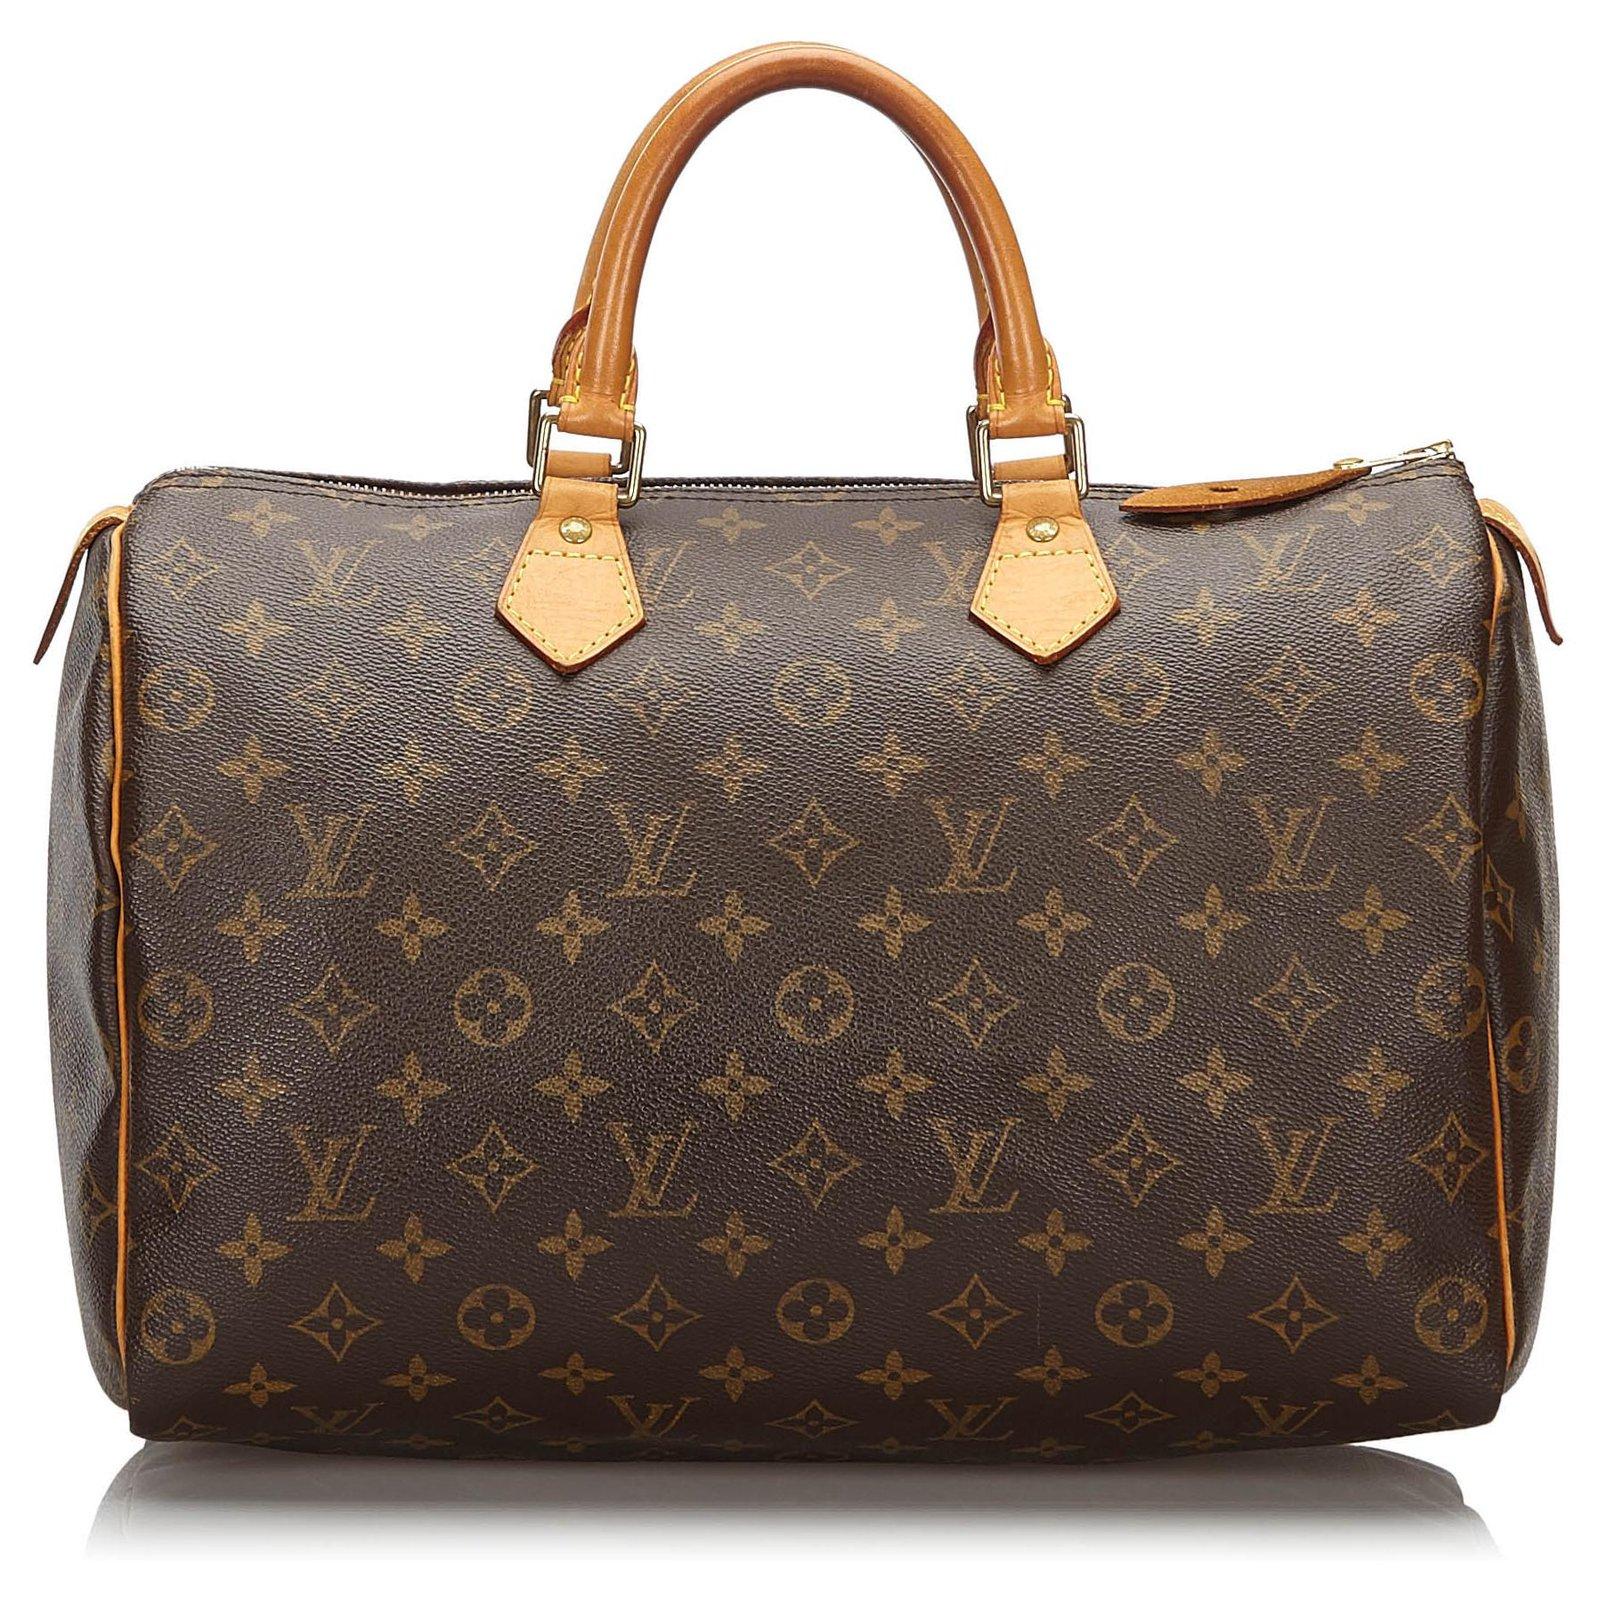 Louis Vuitton Monogram Empreinte Bags with Pins Guide